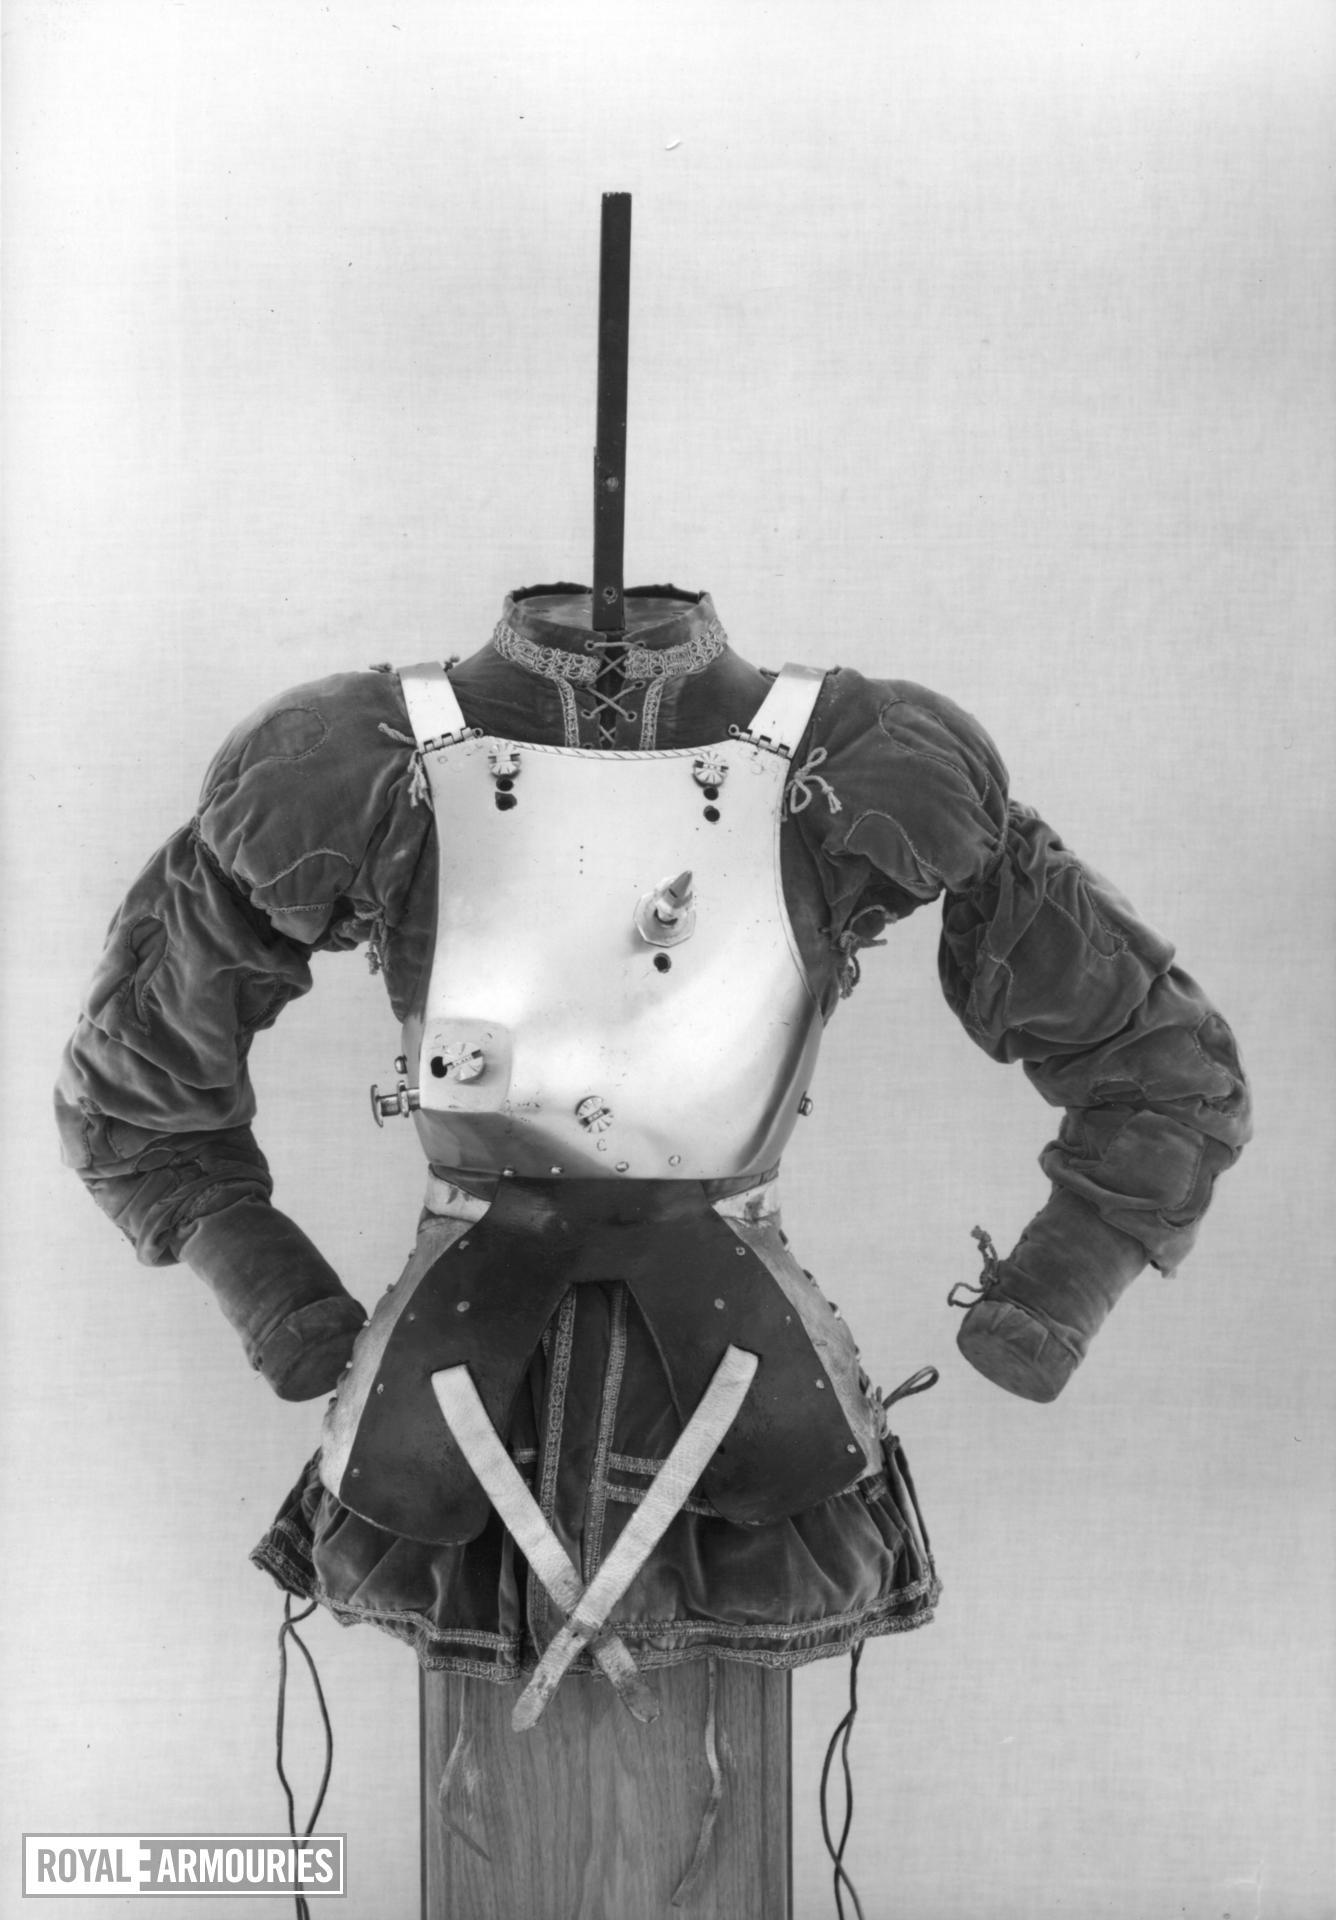 Rennzeug - Jousting Armour for the Scharfrennen